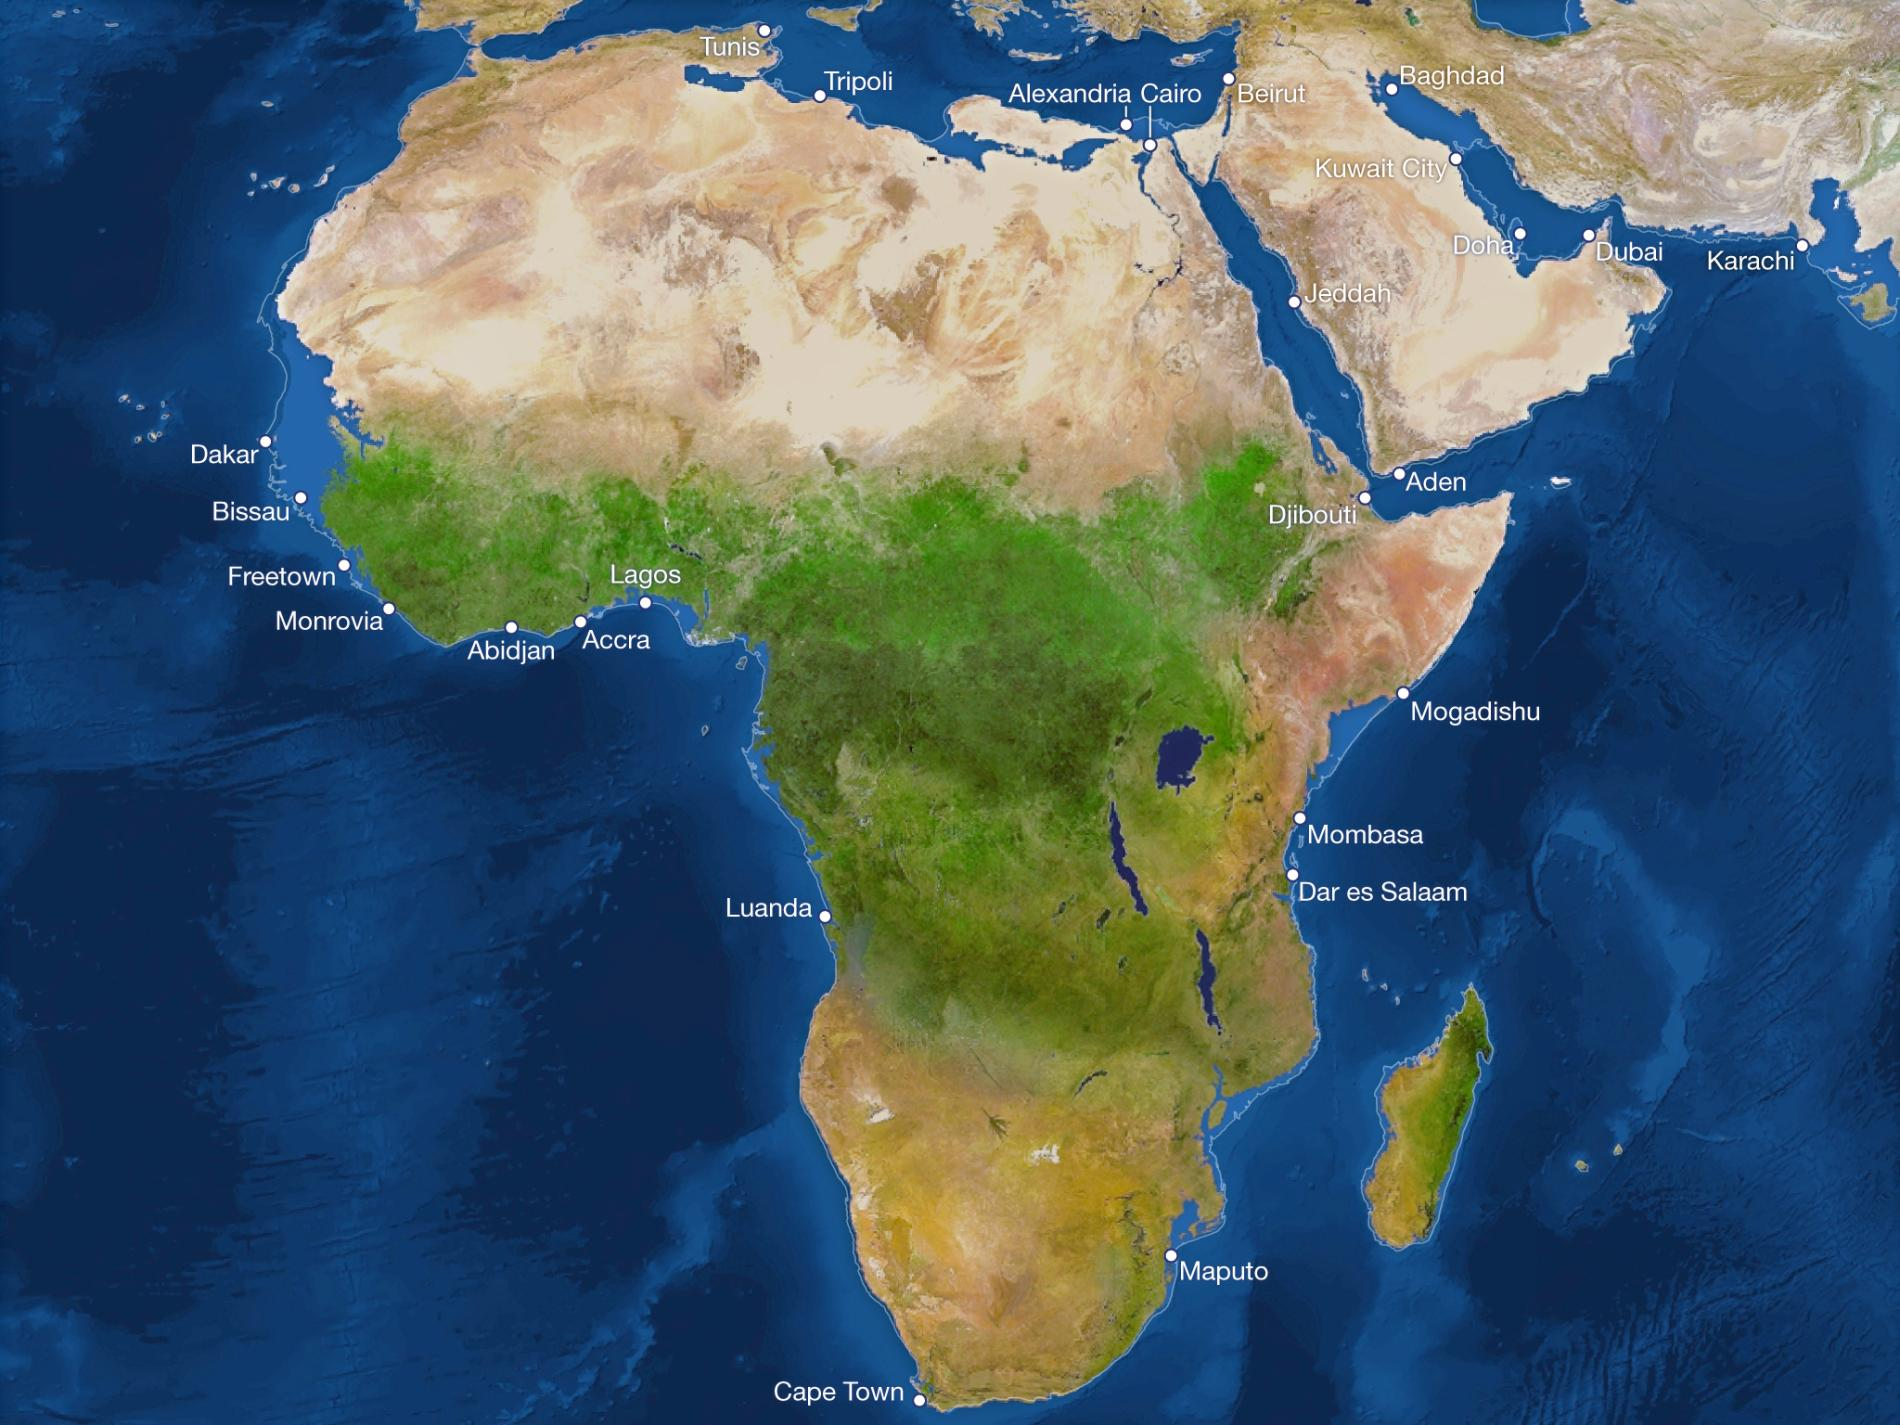 03-ice-melt-africa.adapt.1900.1